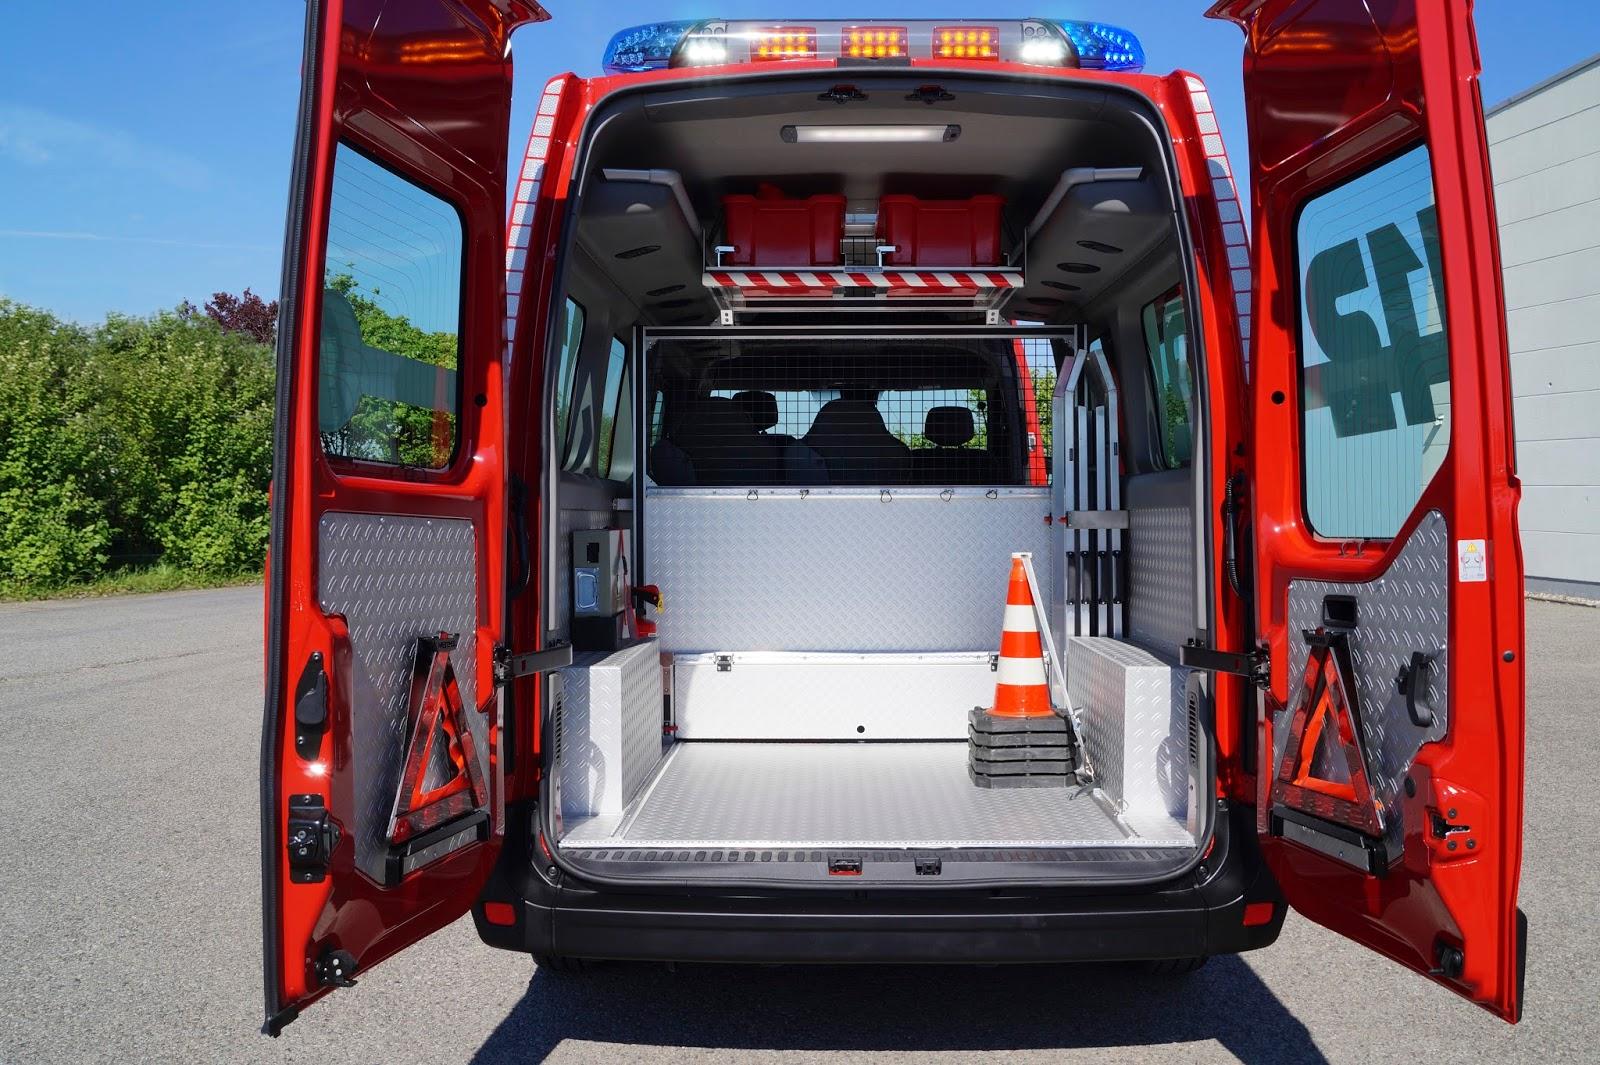 2016 Opel RETTmobil 301162 Το Opel Astra Sports Tourer ως όχημα άμεσης επέμβασης σε περιπτώσεις έκτακτης ανάγκης Opel, Opel Astra Sports Tourer, Opel Movano, RETTmobil, Έκθεση, Επαγγελματικά